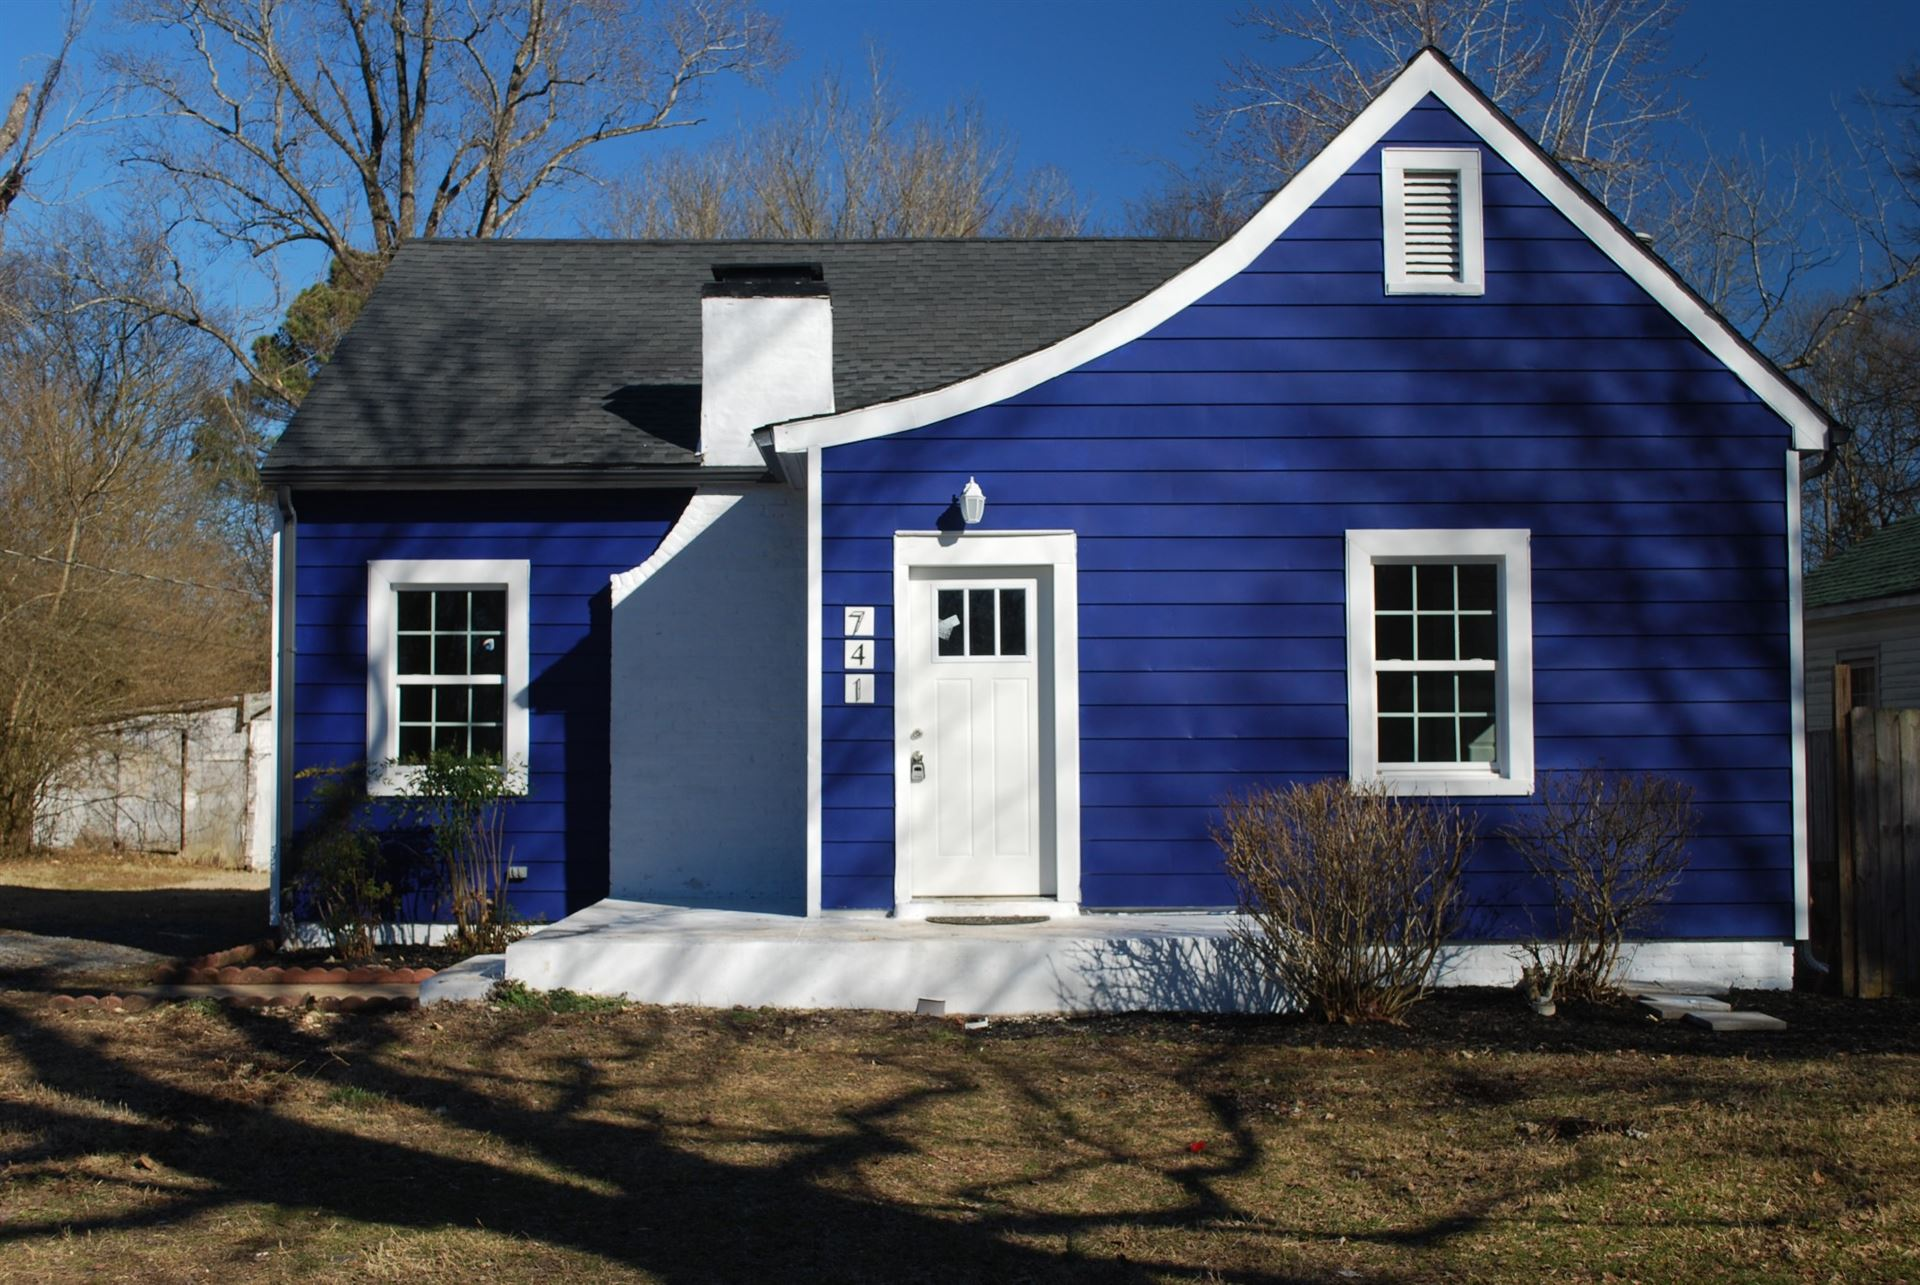 741 Gracey Ave, Clarksville, TN 37040 - MLS#: 2230615